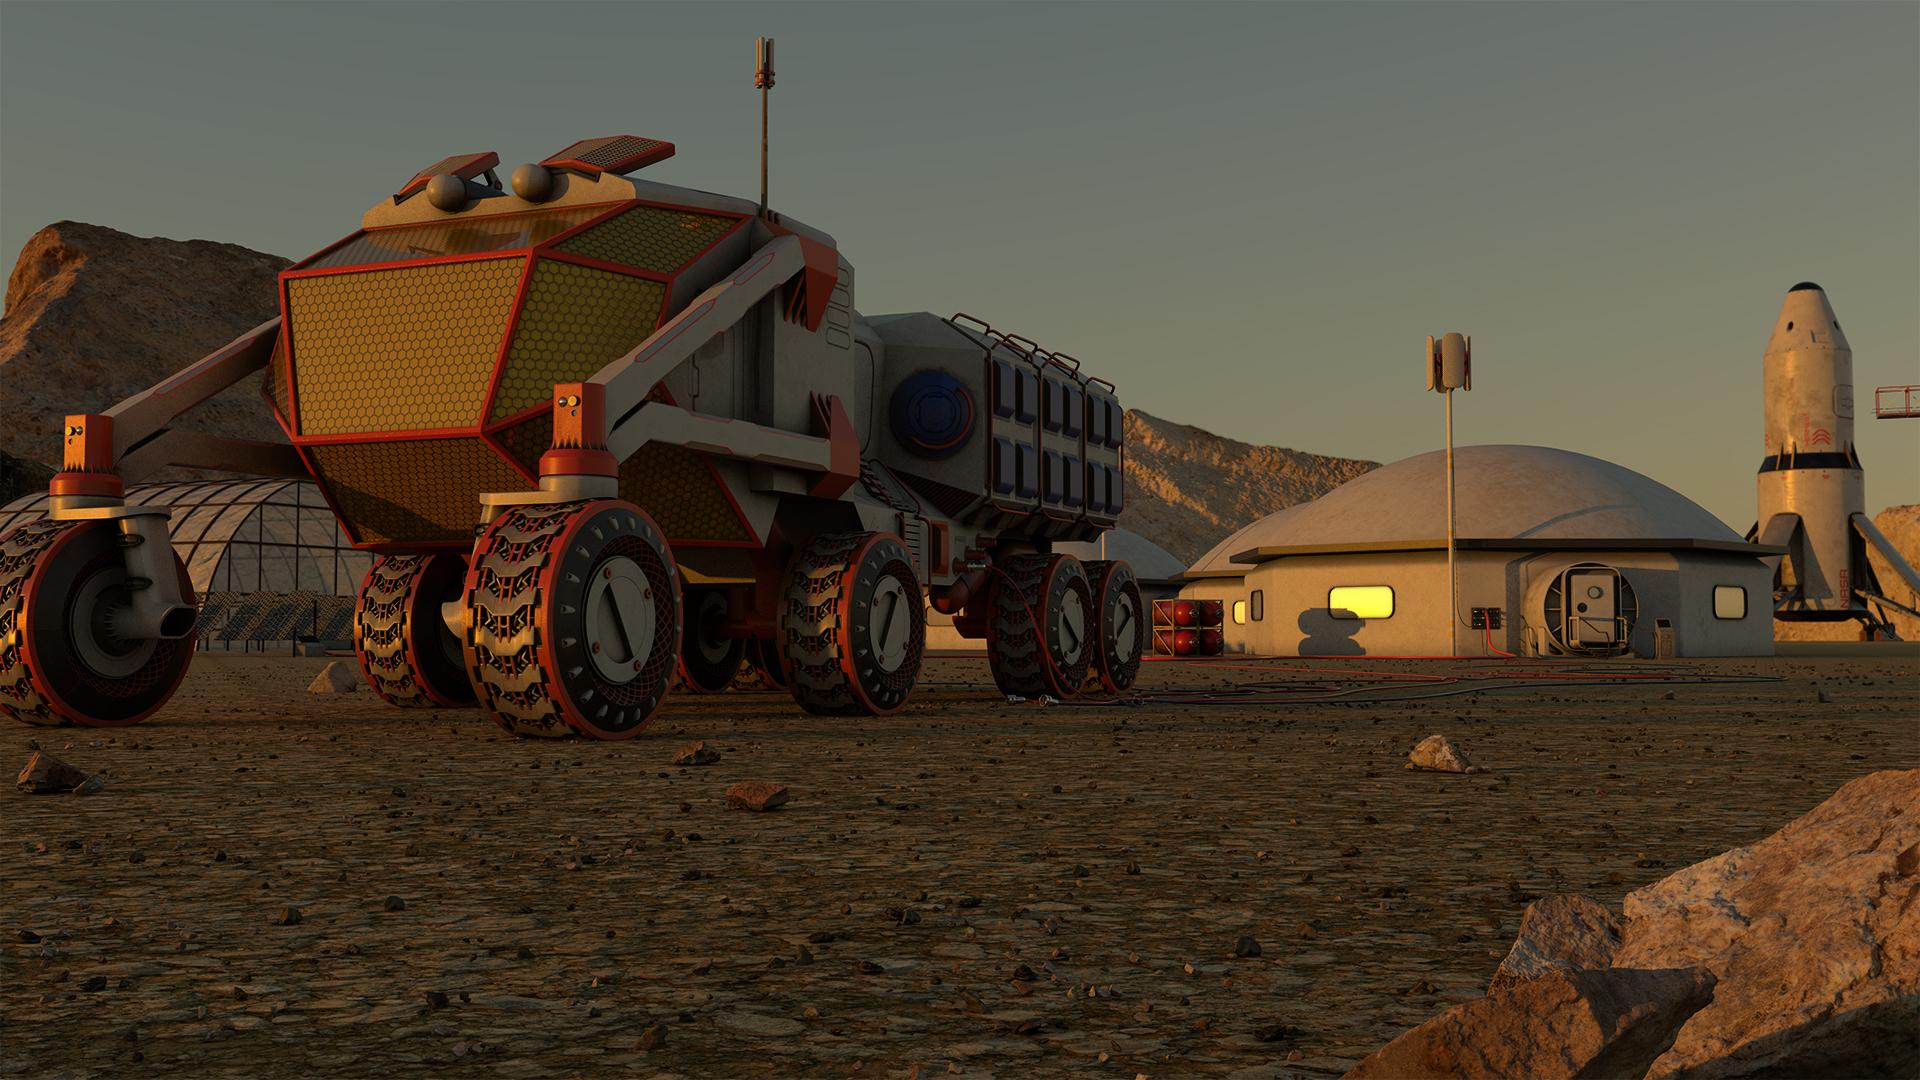 Space Rover Challenge 2020 [Farhan Khan]